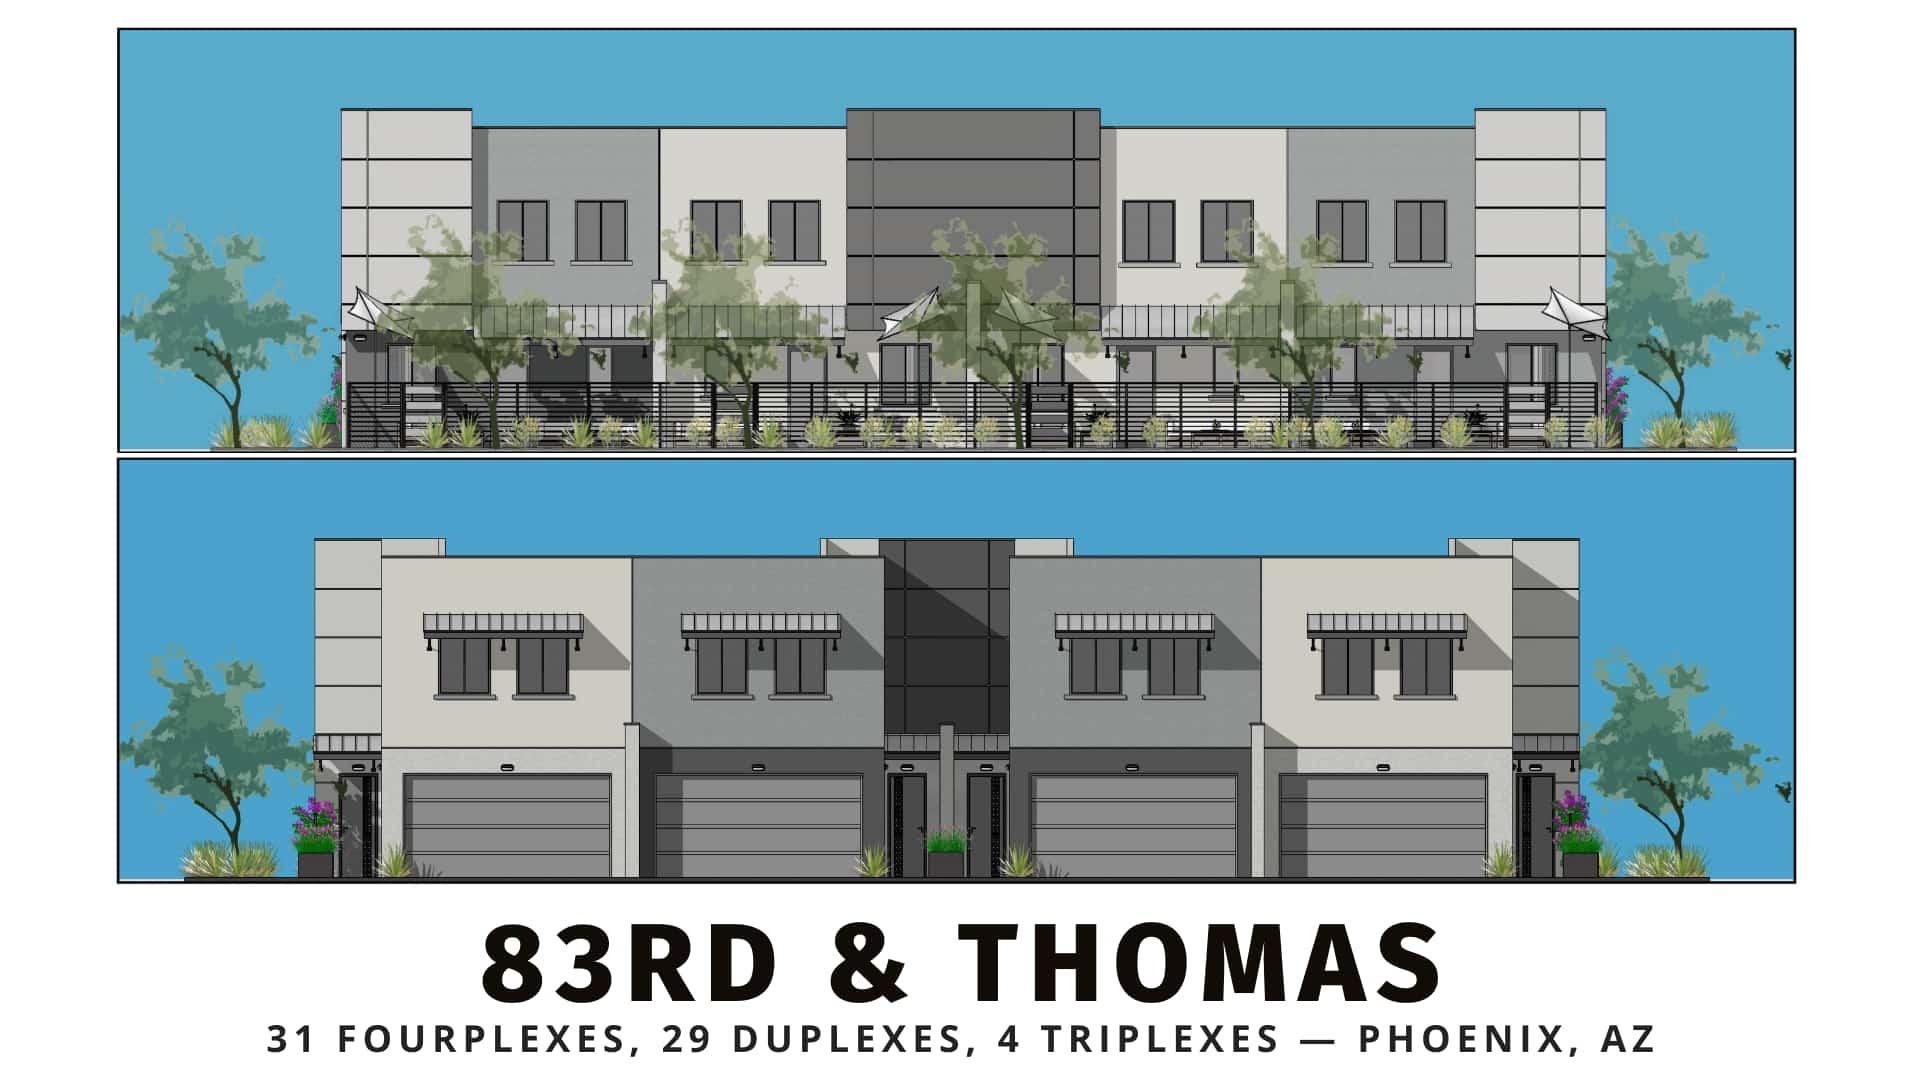 83rd & Thomas townhomes North Phoenix